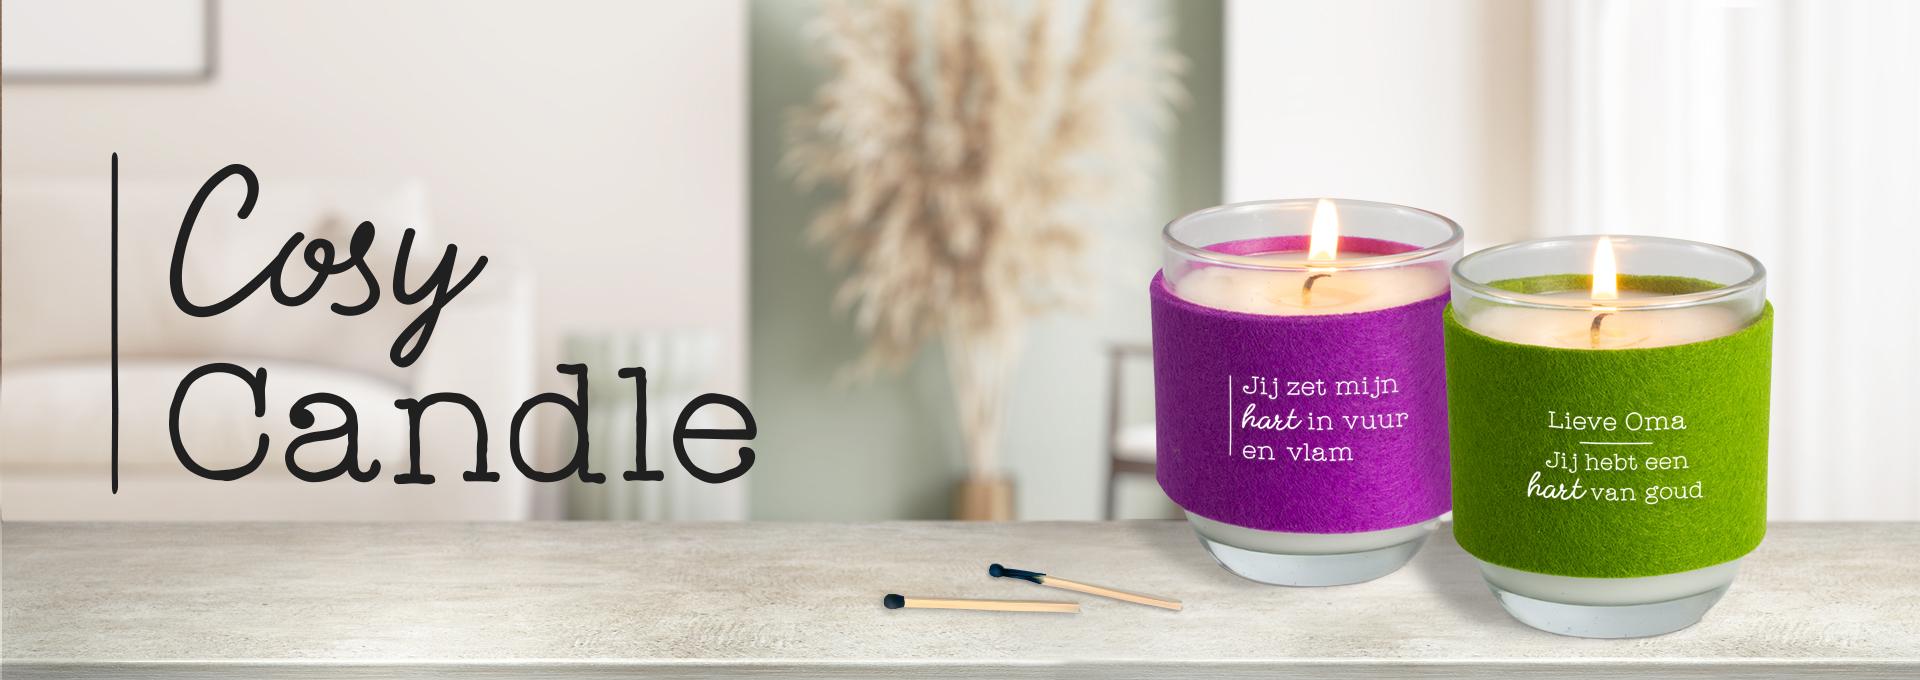 Kaars Candle Cosy Candle Groothandel Cadeau Verlichting Decoratie